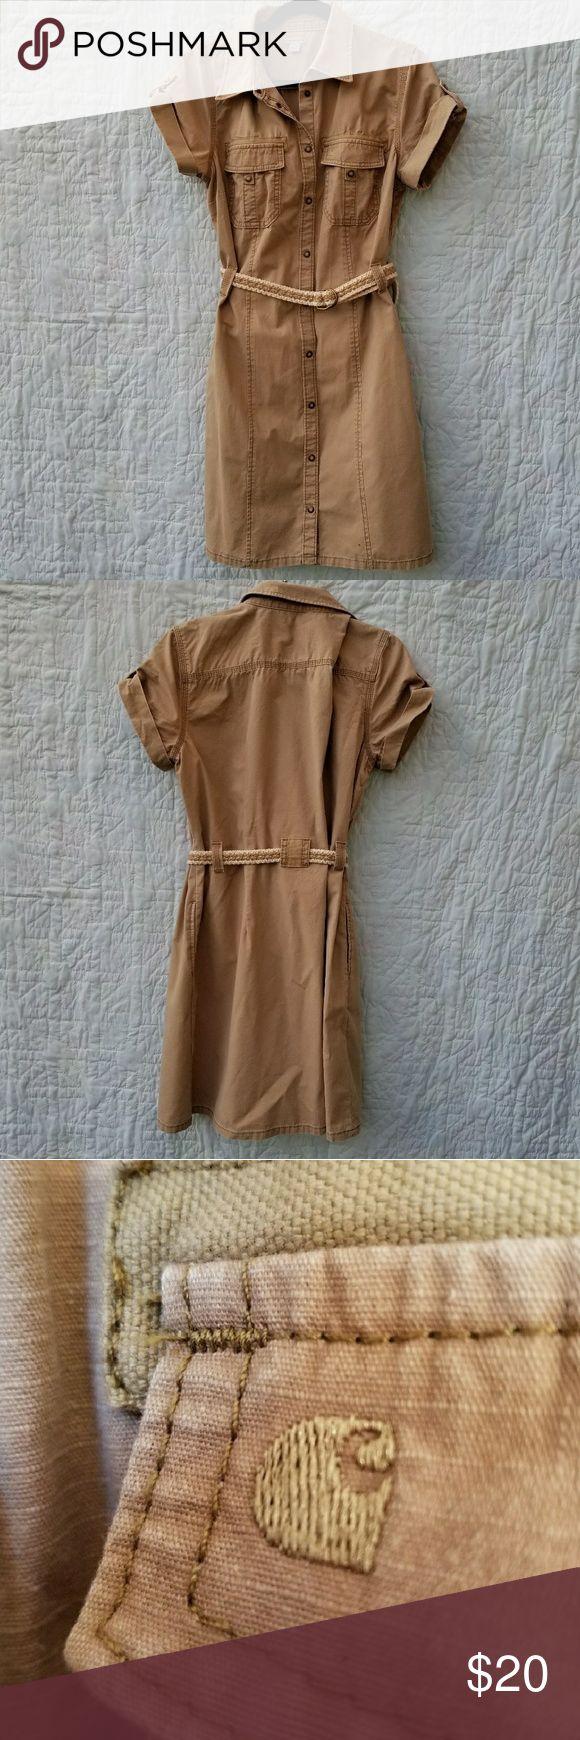 Carhartt Shirt dress Khaki Carhartt Shirt dress. Snaps down, embroidered logo on front pocket. 100% cotton, machine wash. Carhartt Dresses